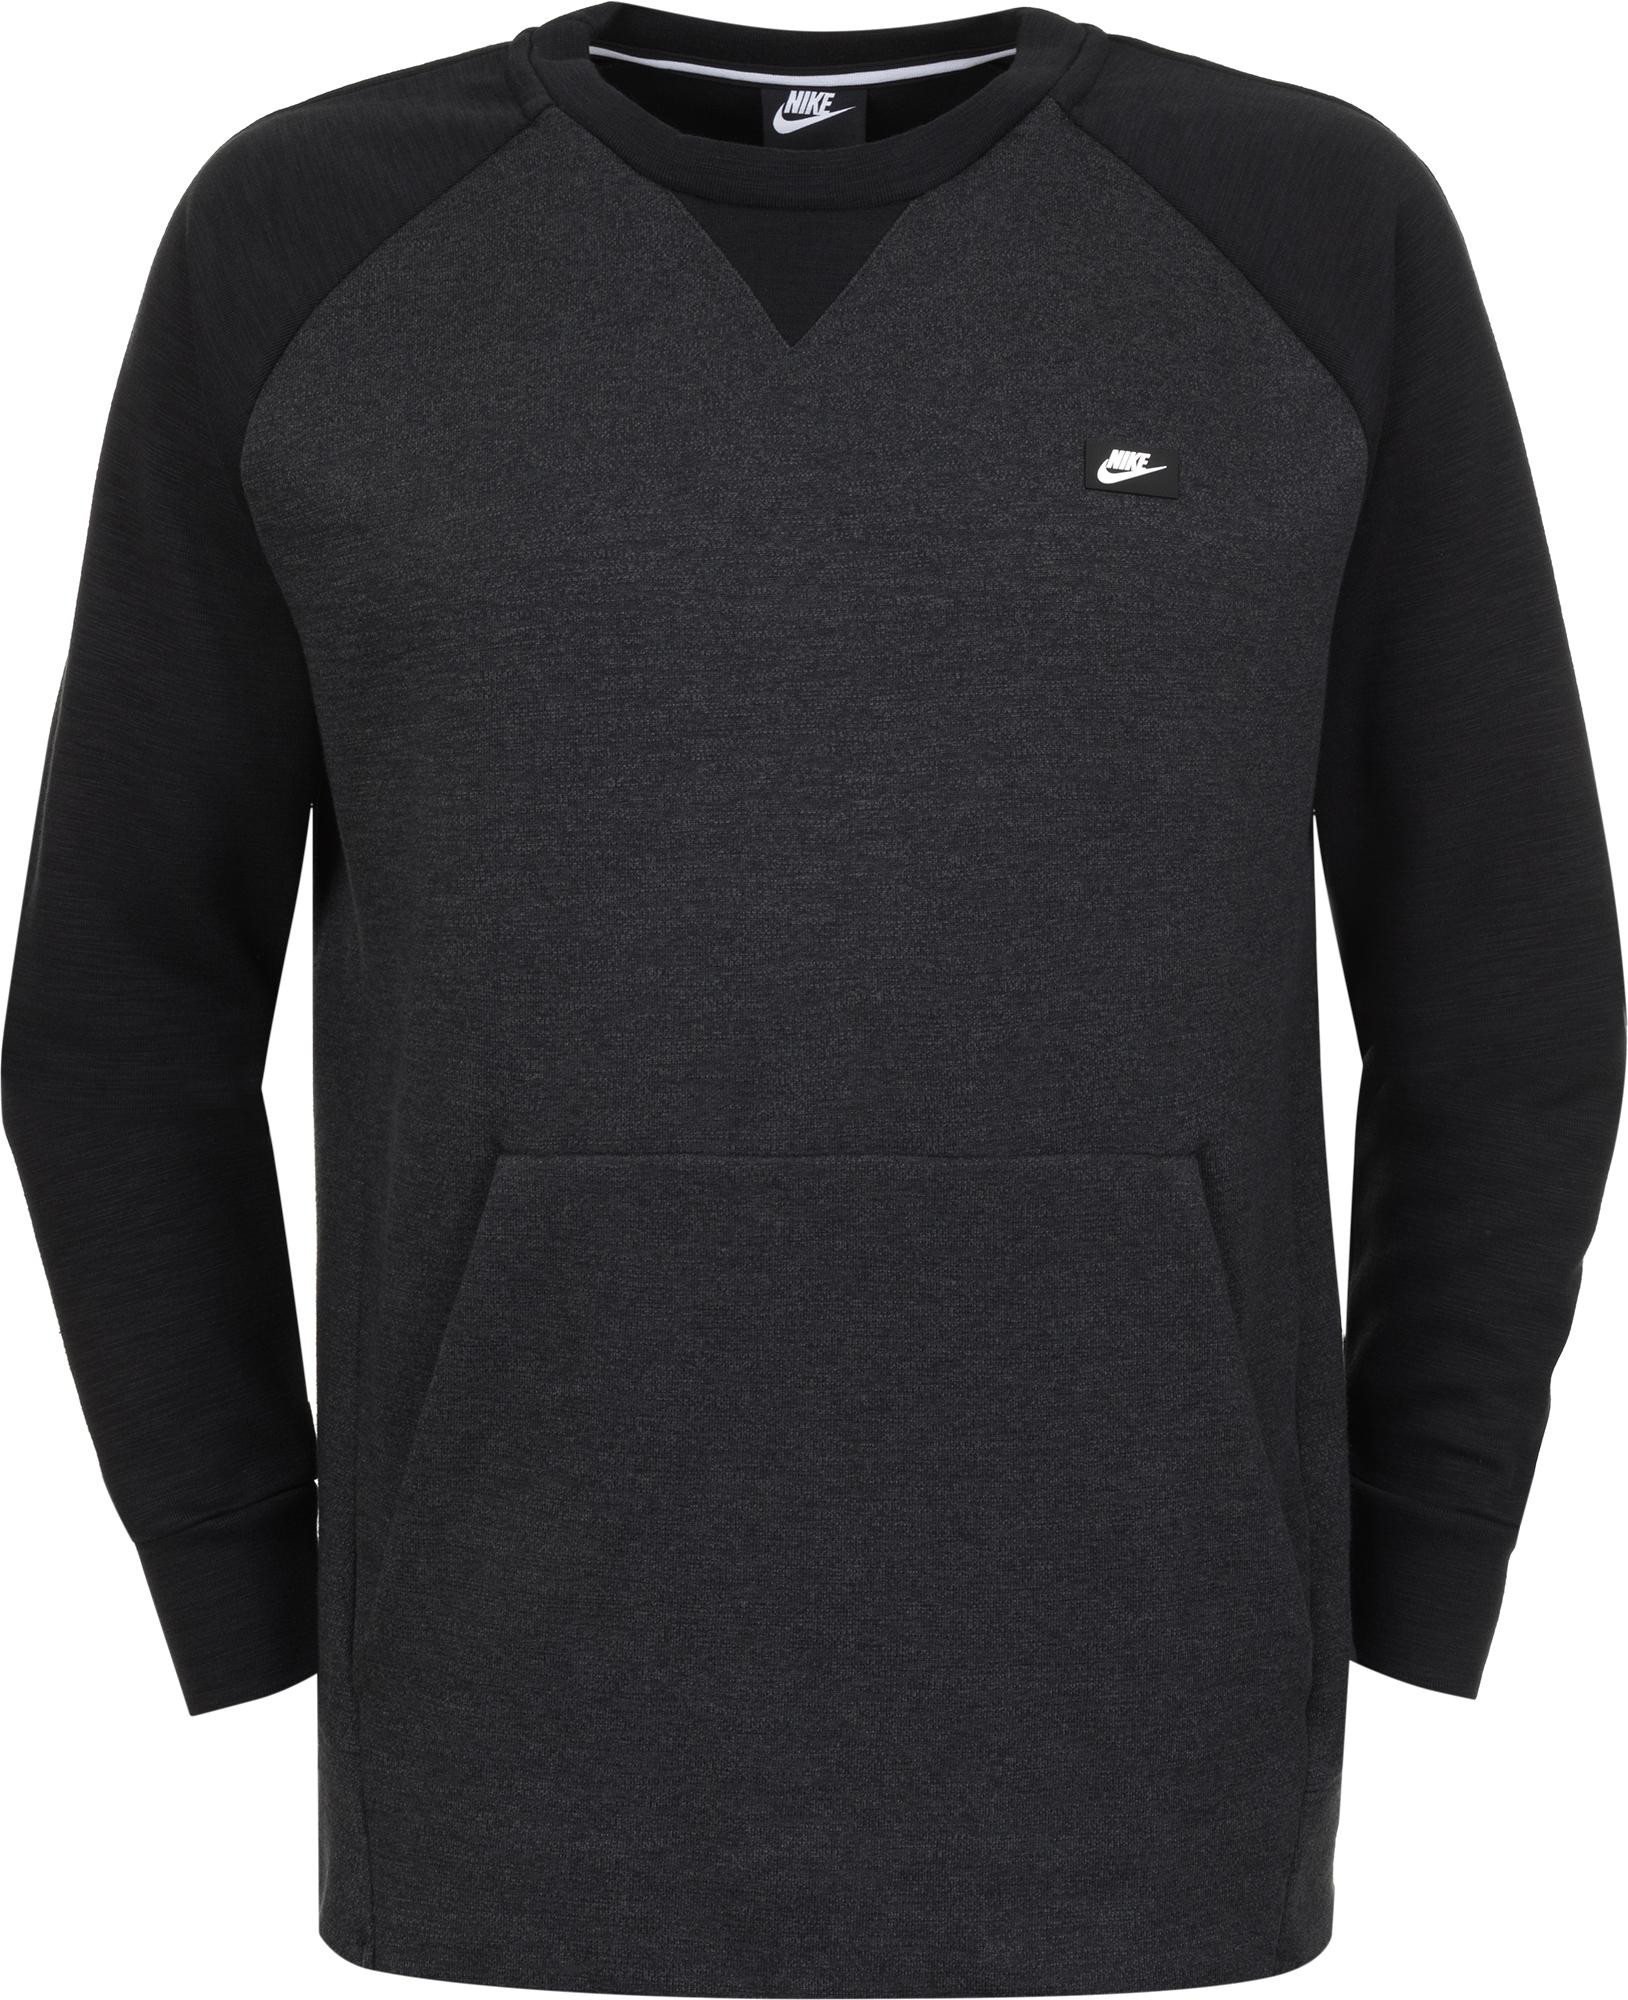 Nike Джемпер мужской Nike Sportswear Optic, размер 52-54